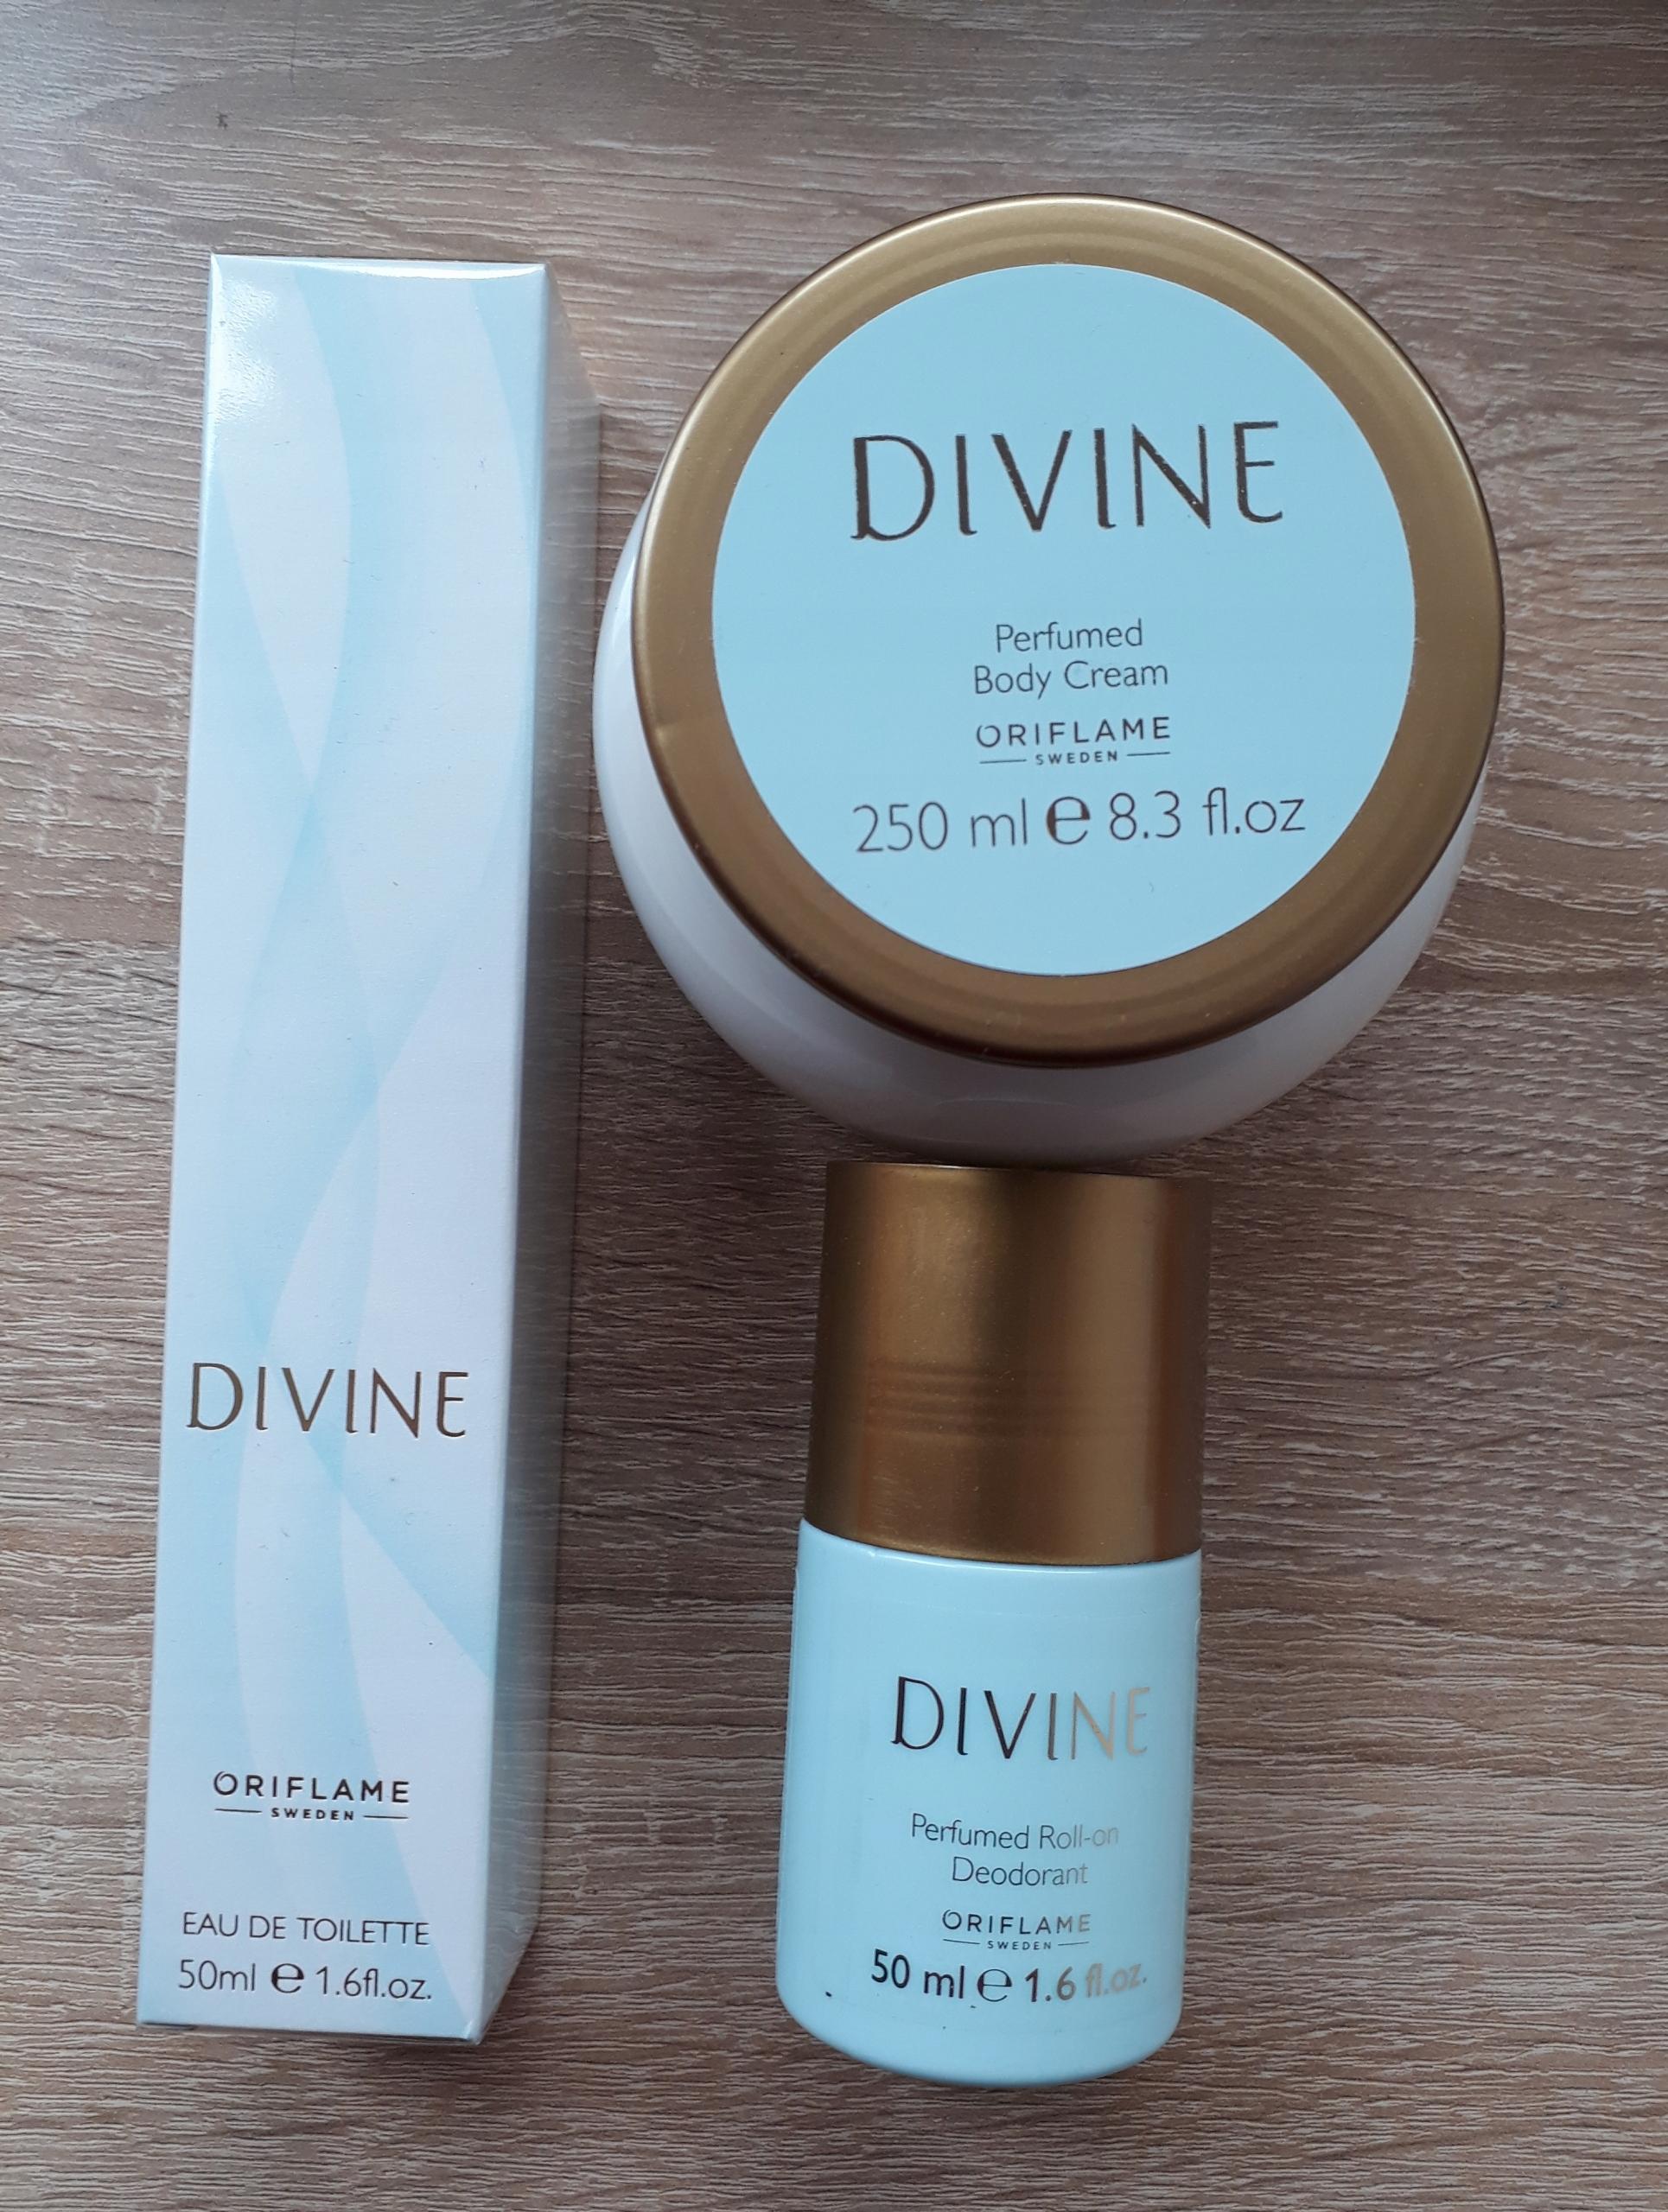 Zestaw Divine (perfumy + krem + dezodorant kulka)